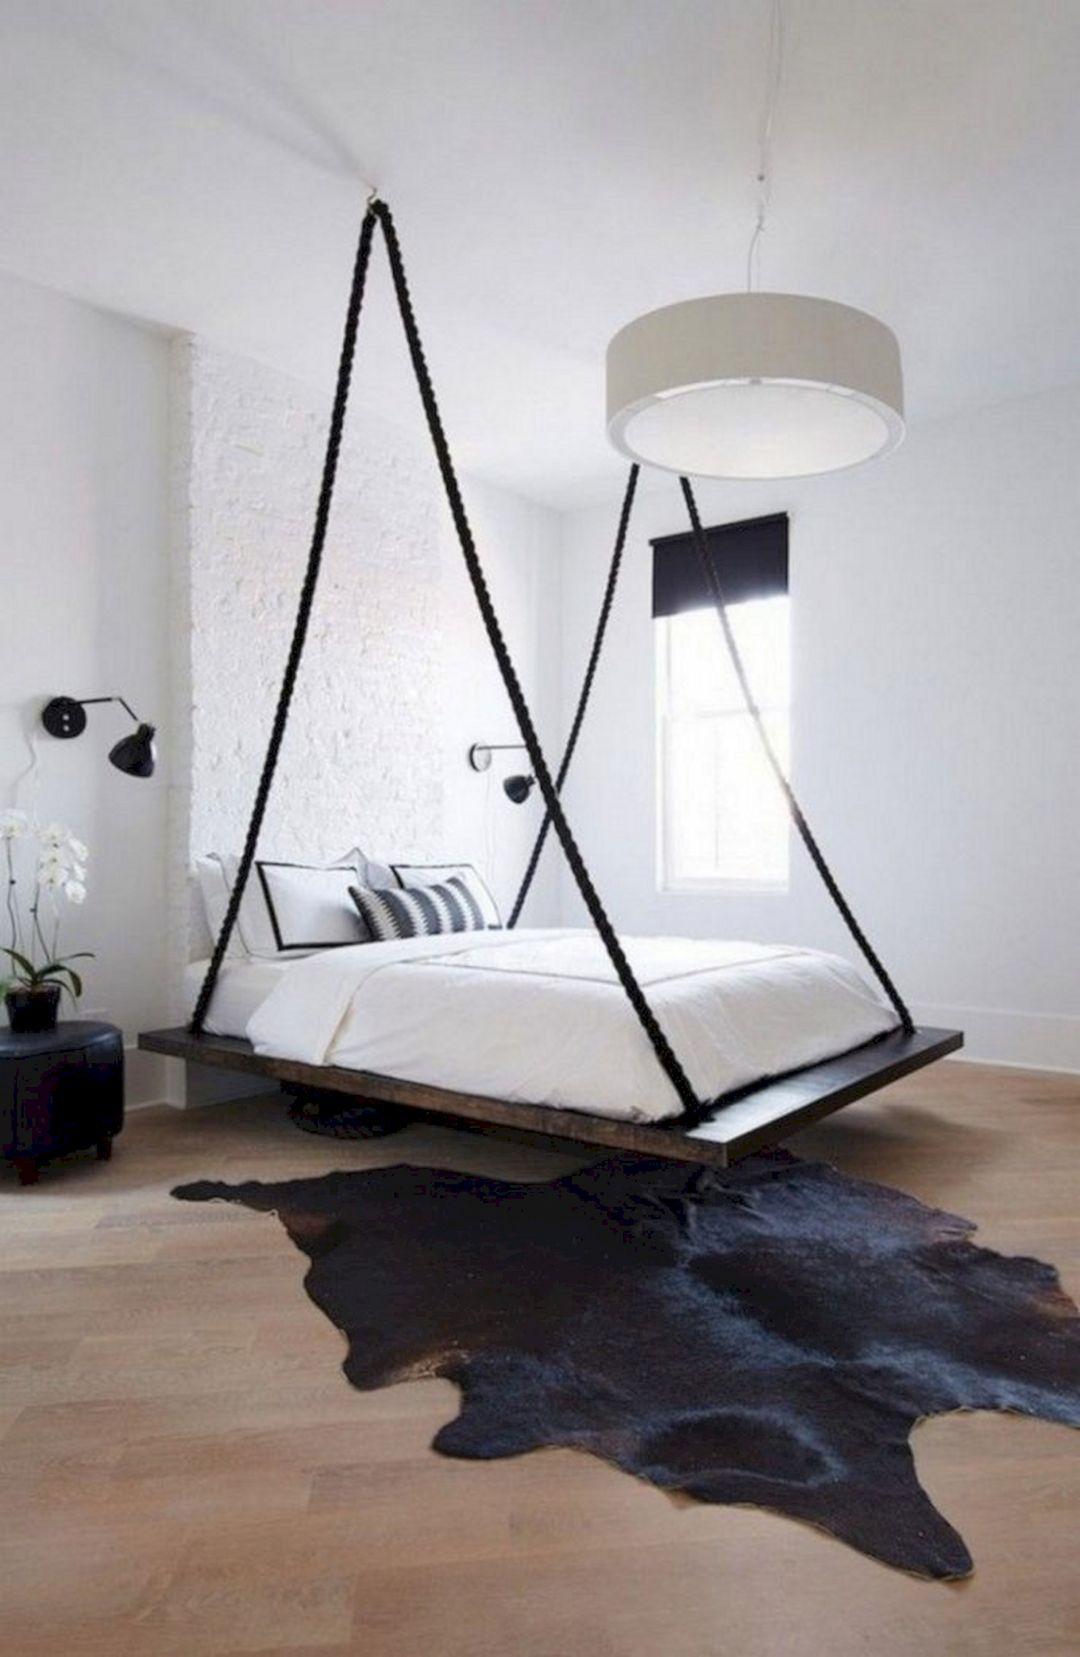 25+ Marvelous Hanging Beds Design For Unique Bedroom Ideas